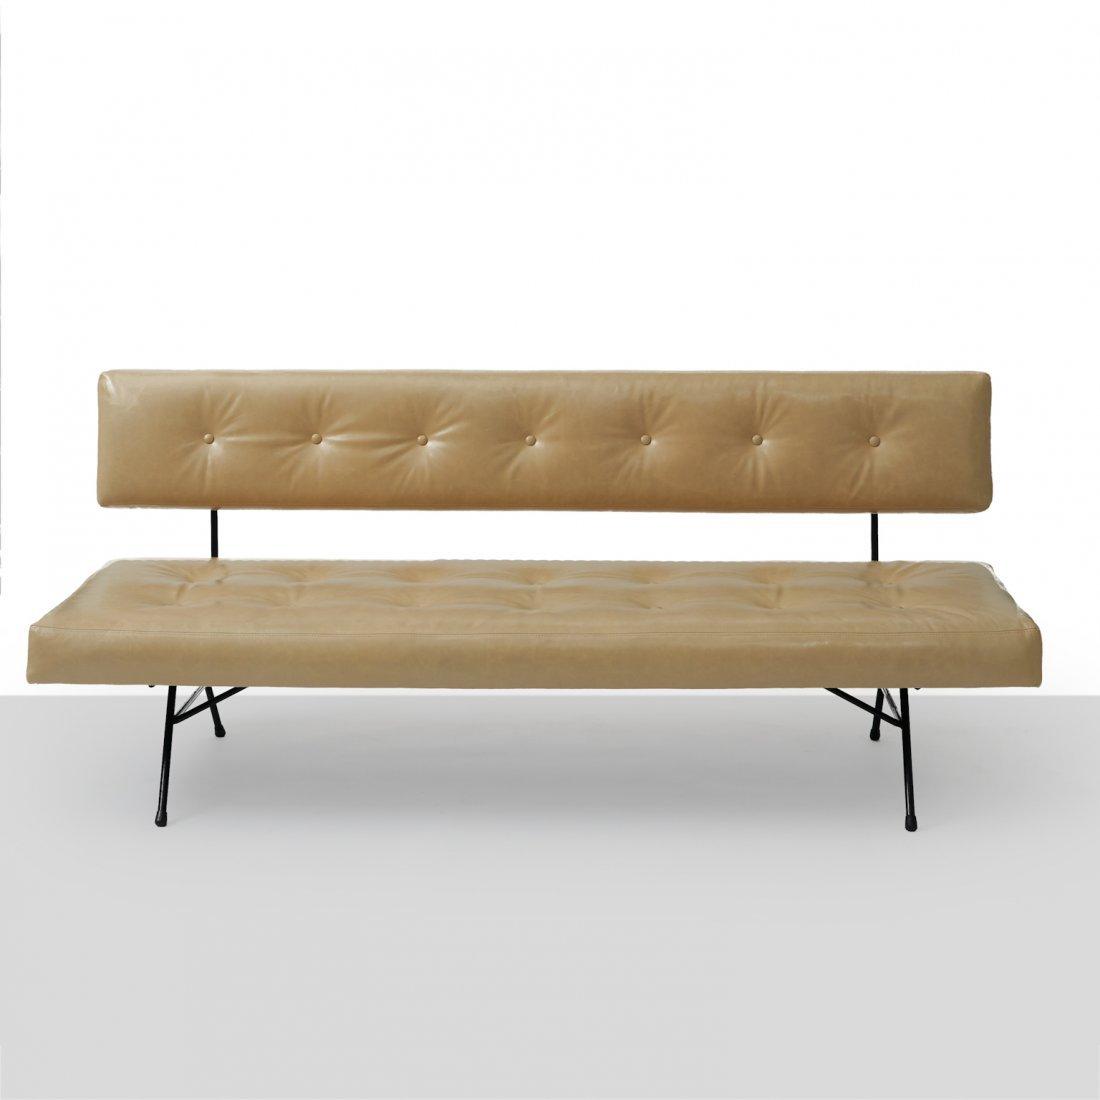 Rare Norman Cherner Sofa - 2